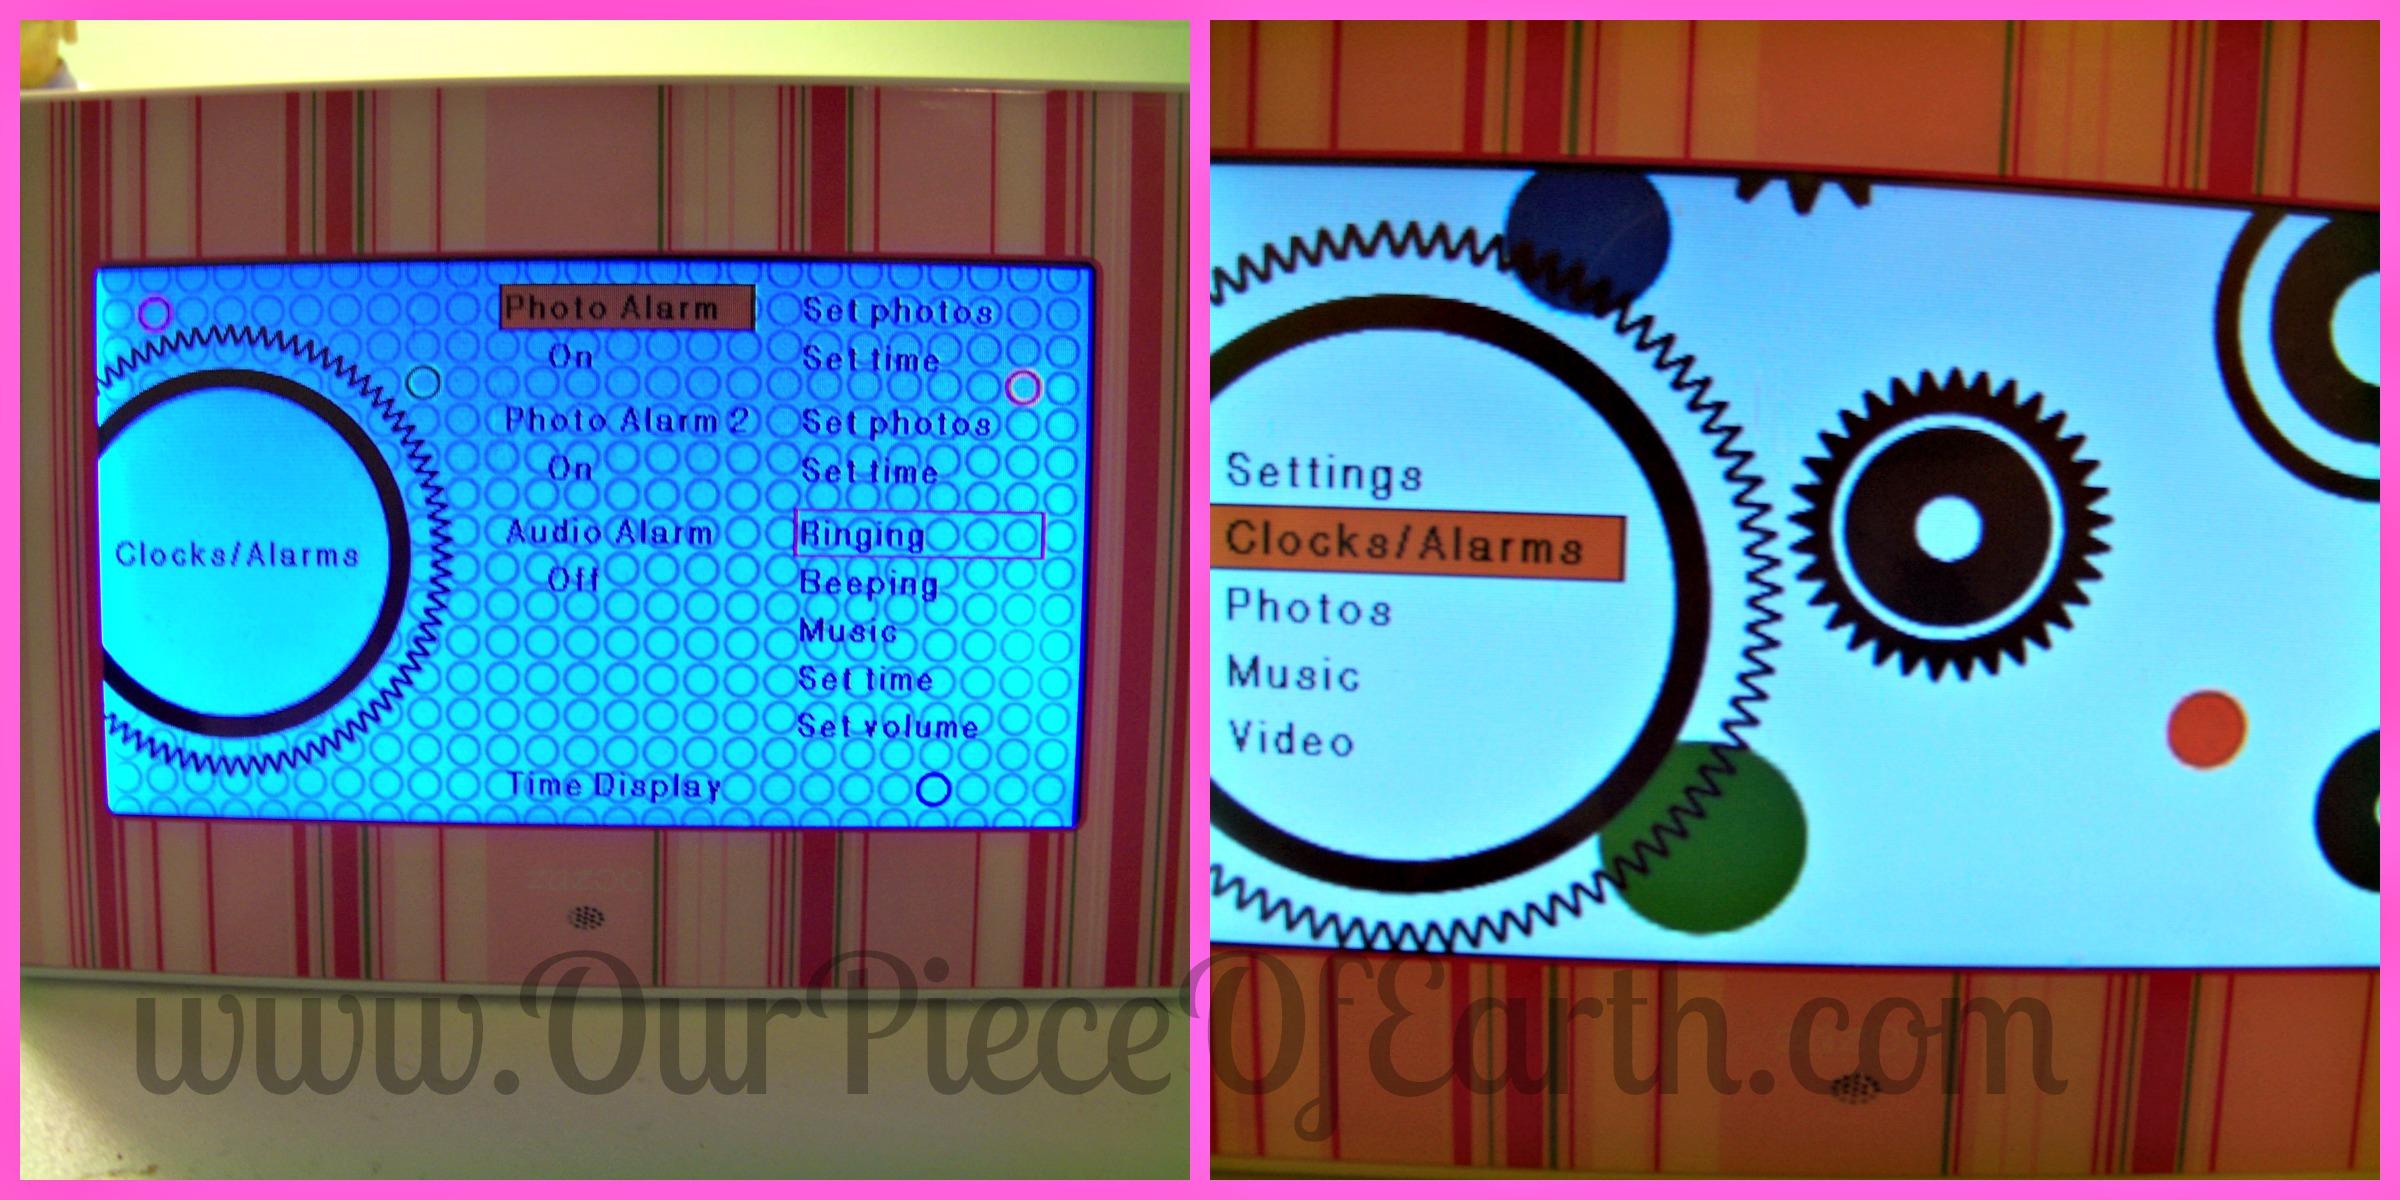 Zazoo photo alarm clock, digital picture frame, alarm clock